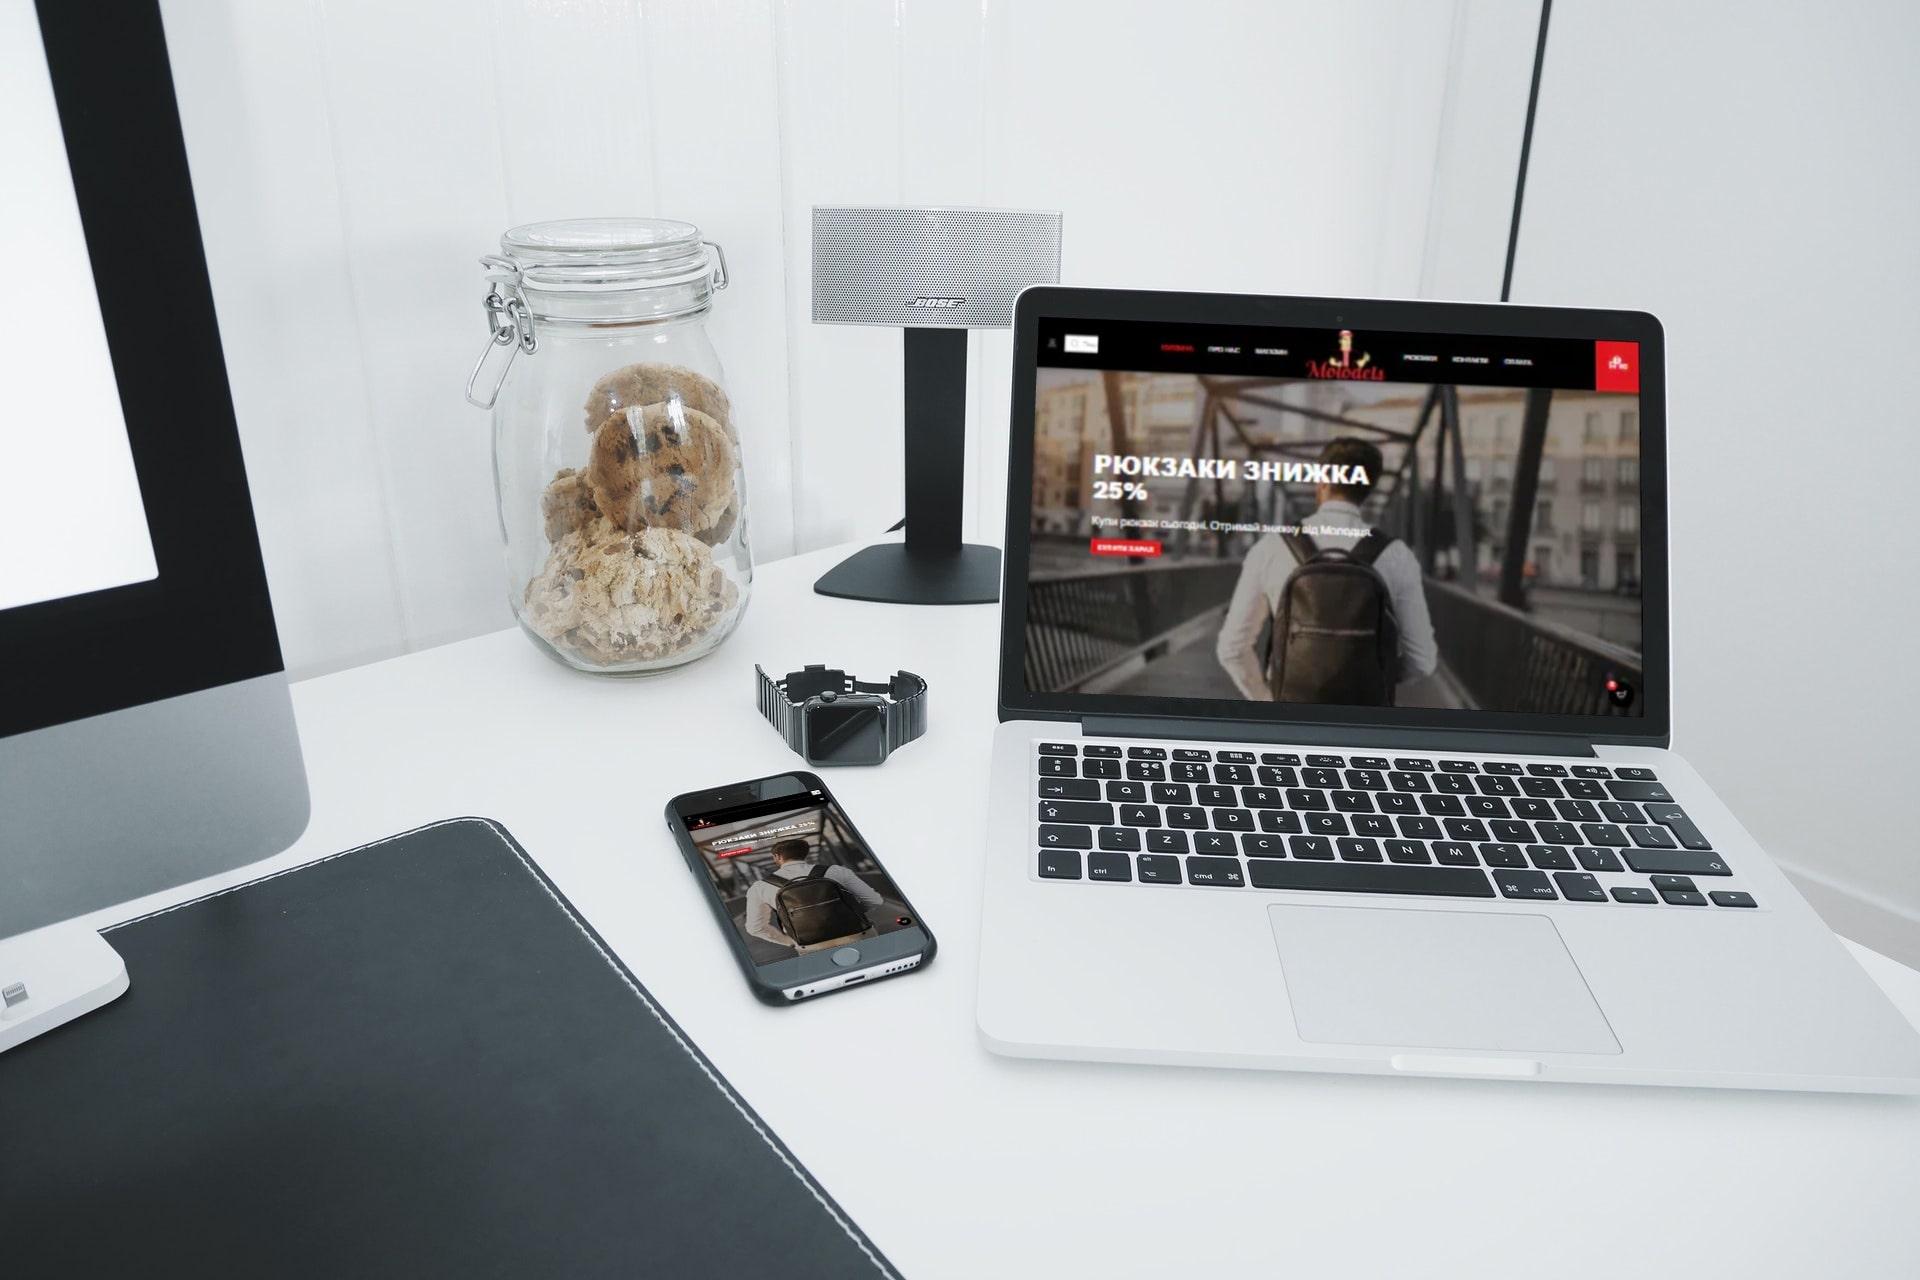 molodets web design project